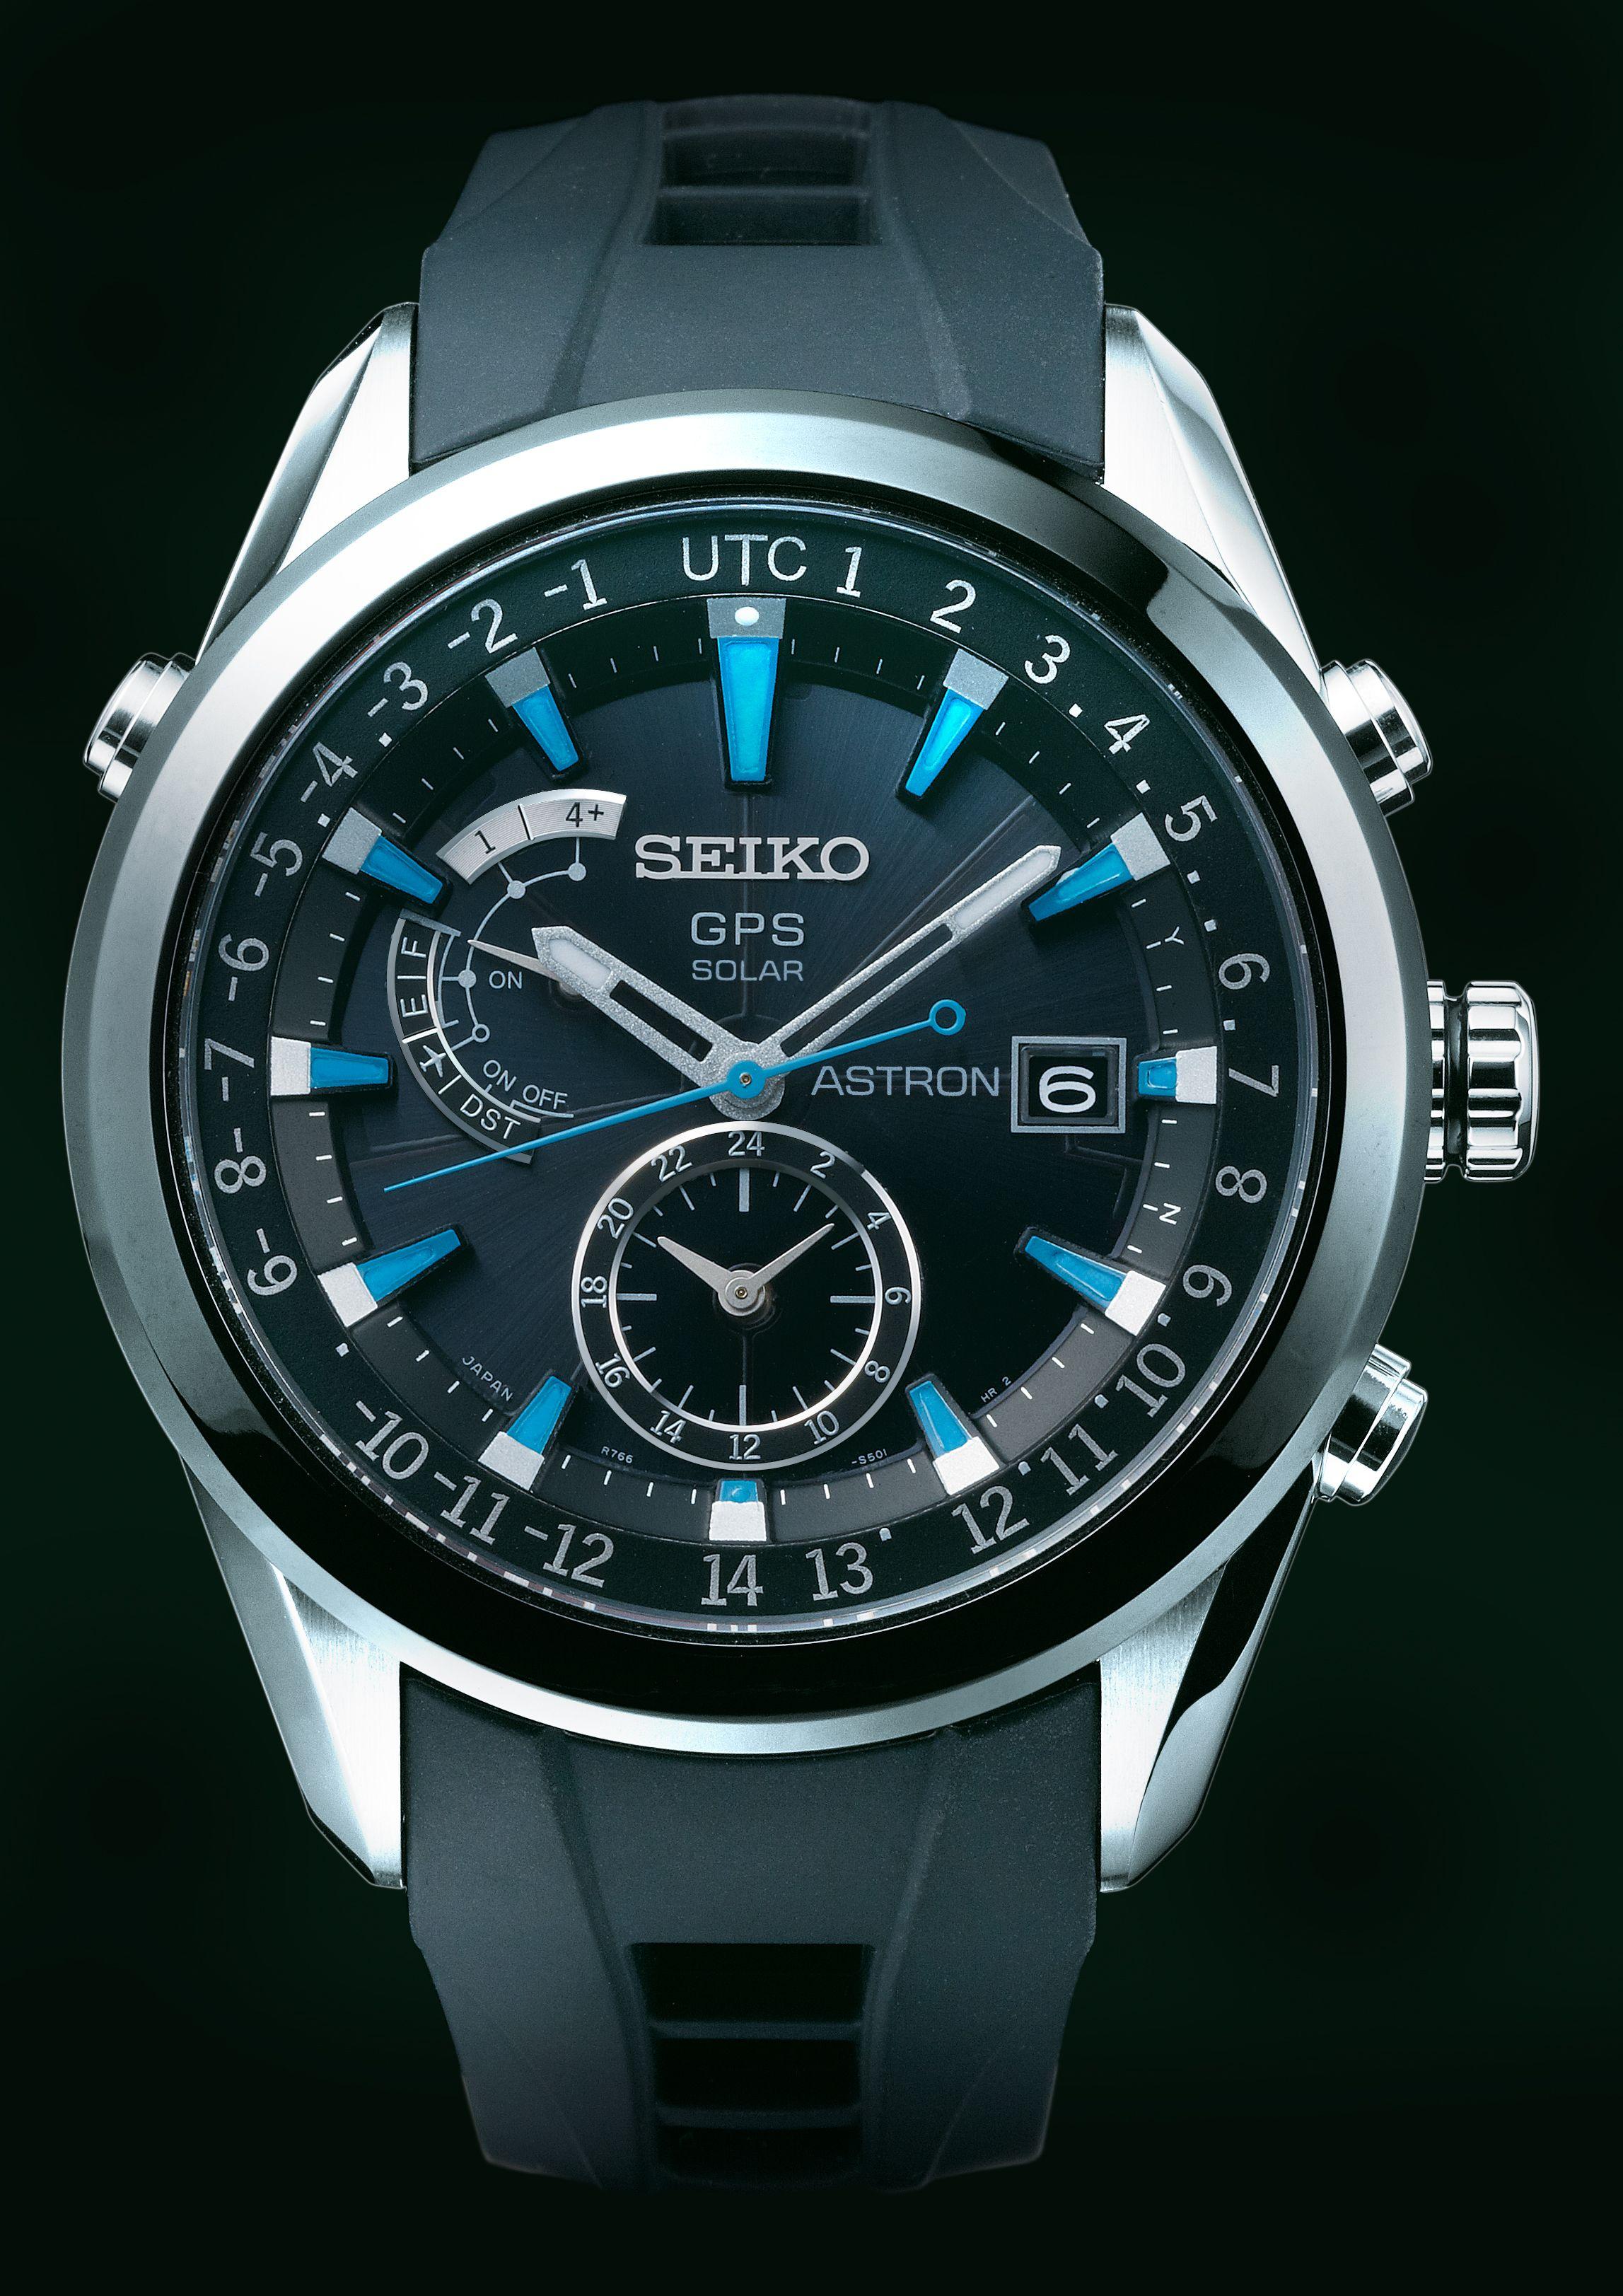 Seiko Astron, GPS Solar Watch, With silicon strap and blue accents, SAST009   www.SeikoUSA.com